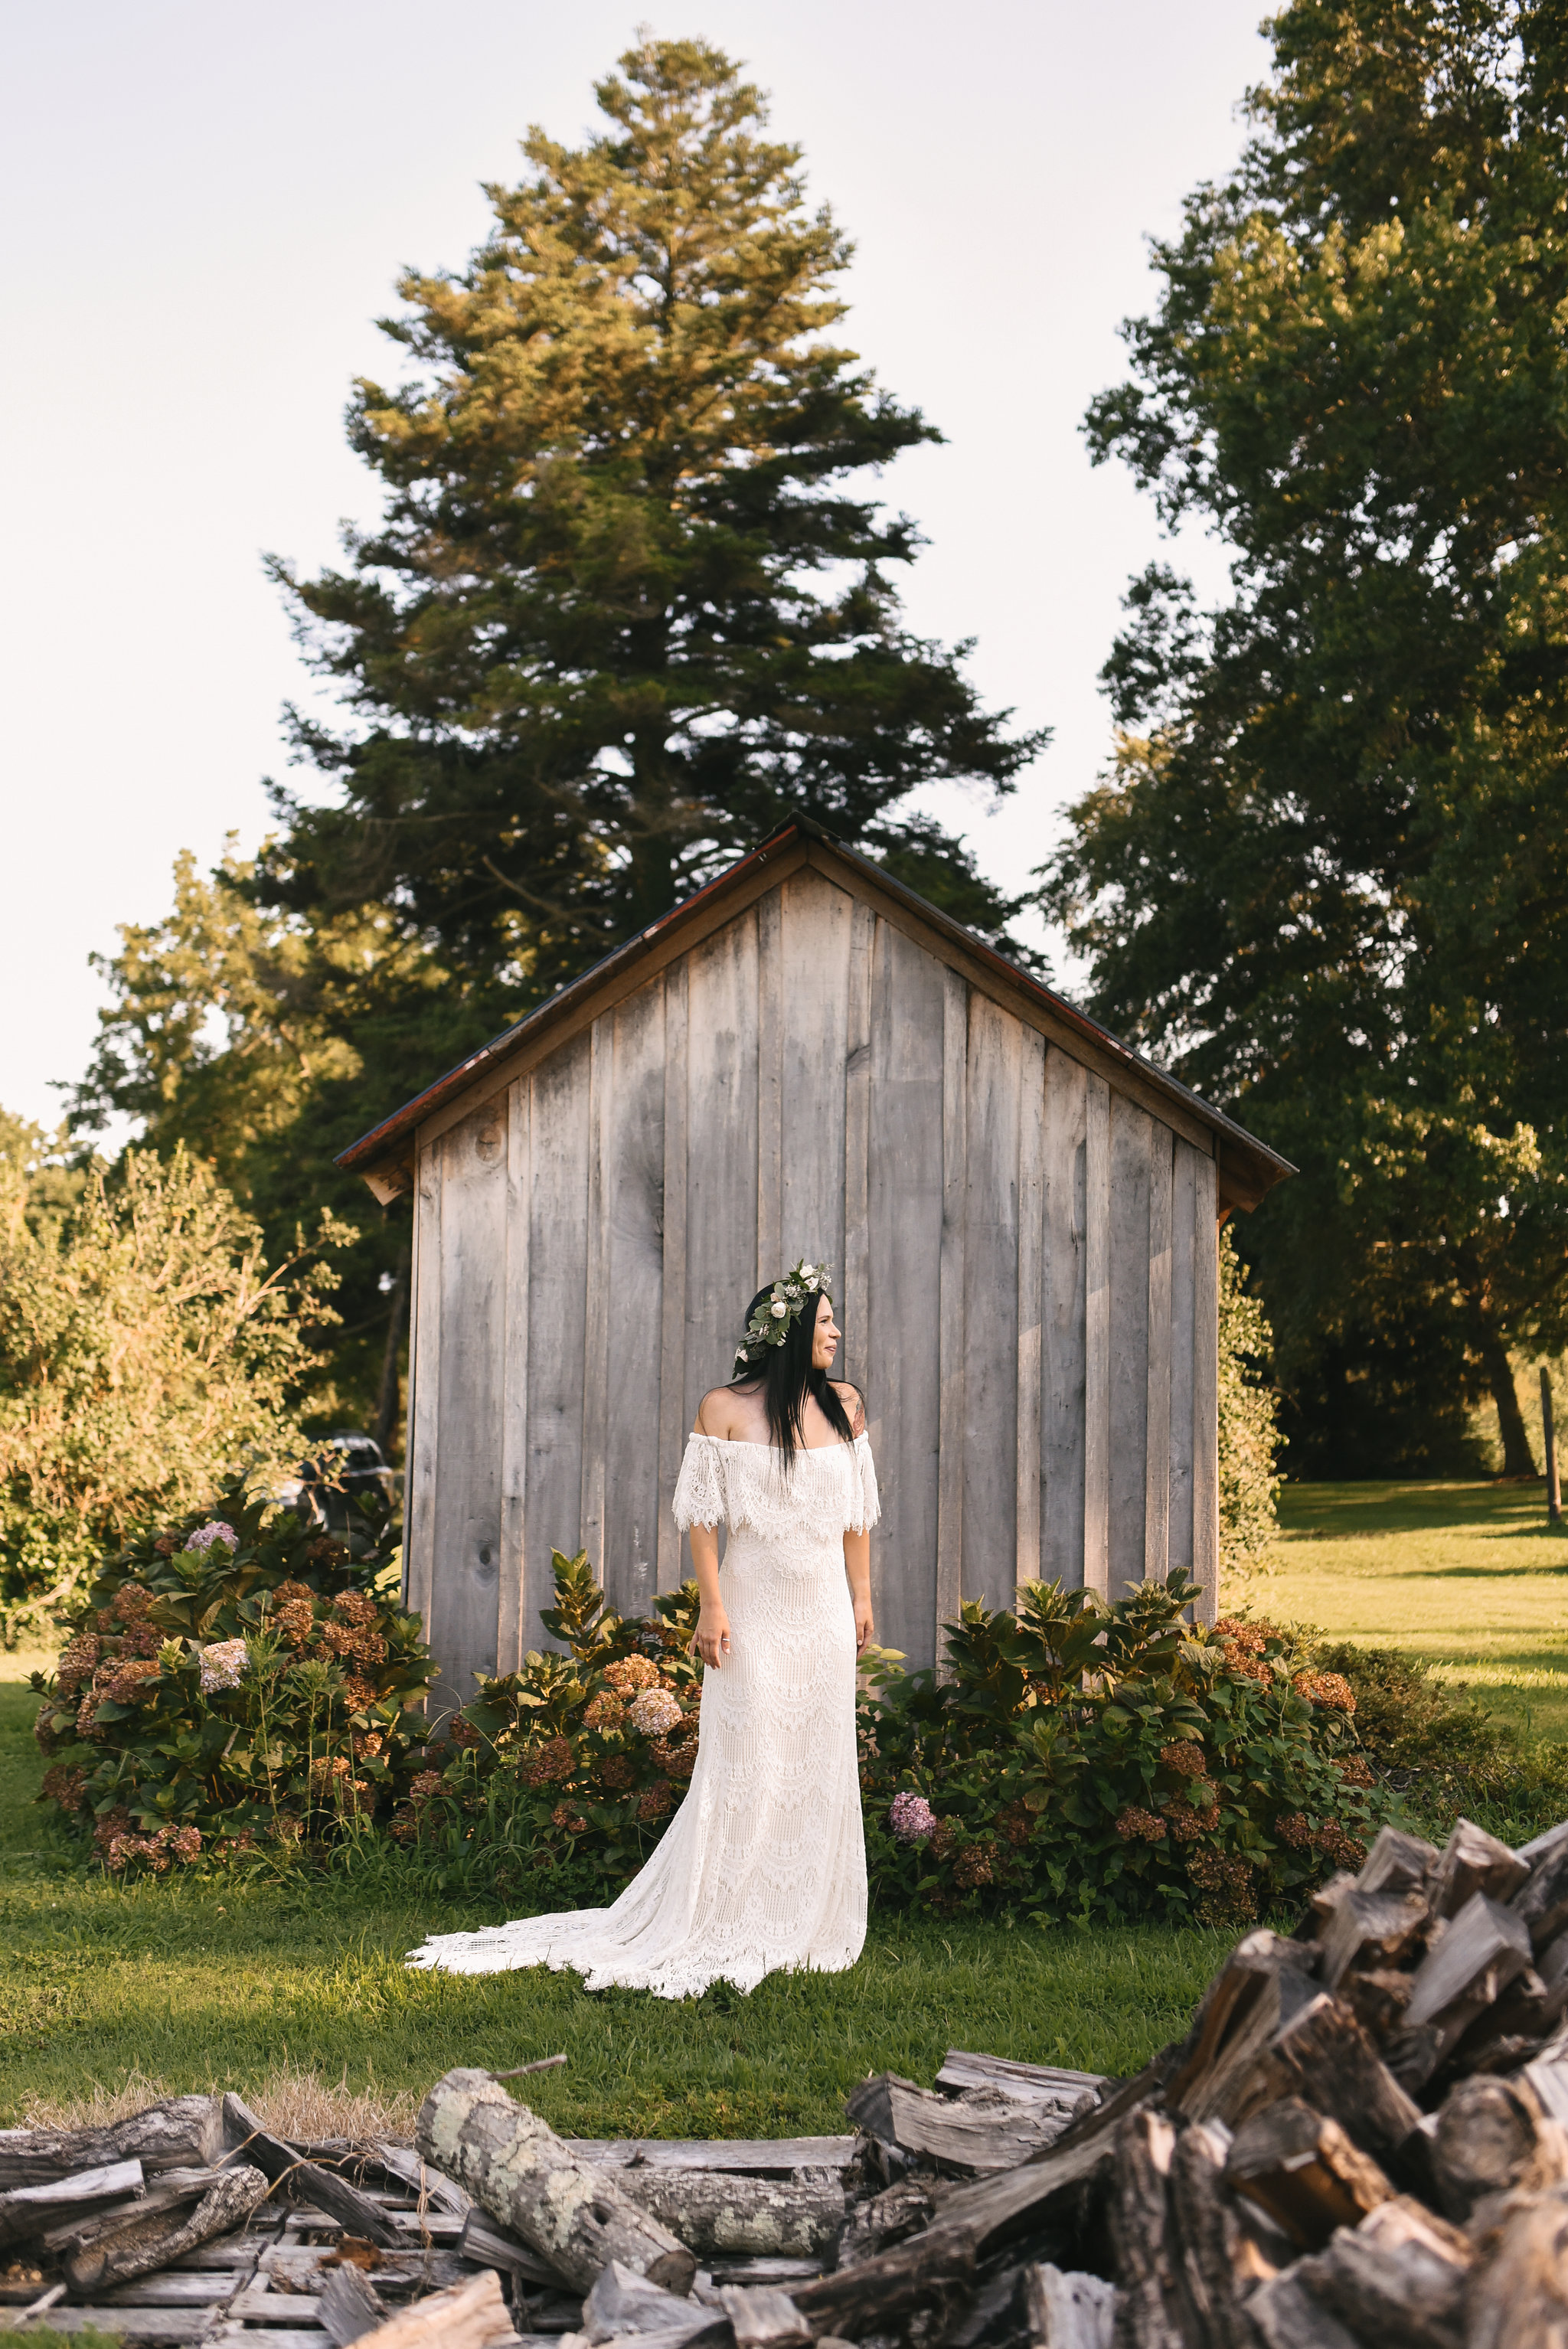 Maryland, Eastern Shore, Baltimore Wedding Photographer, Romantic, Boho, Backyard Wedding, Nature, Portrait of Bride Outside, Daughters of Simone Wedding Dress, Flower Crown